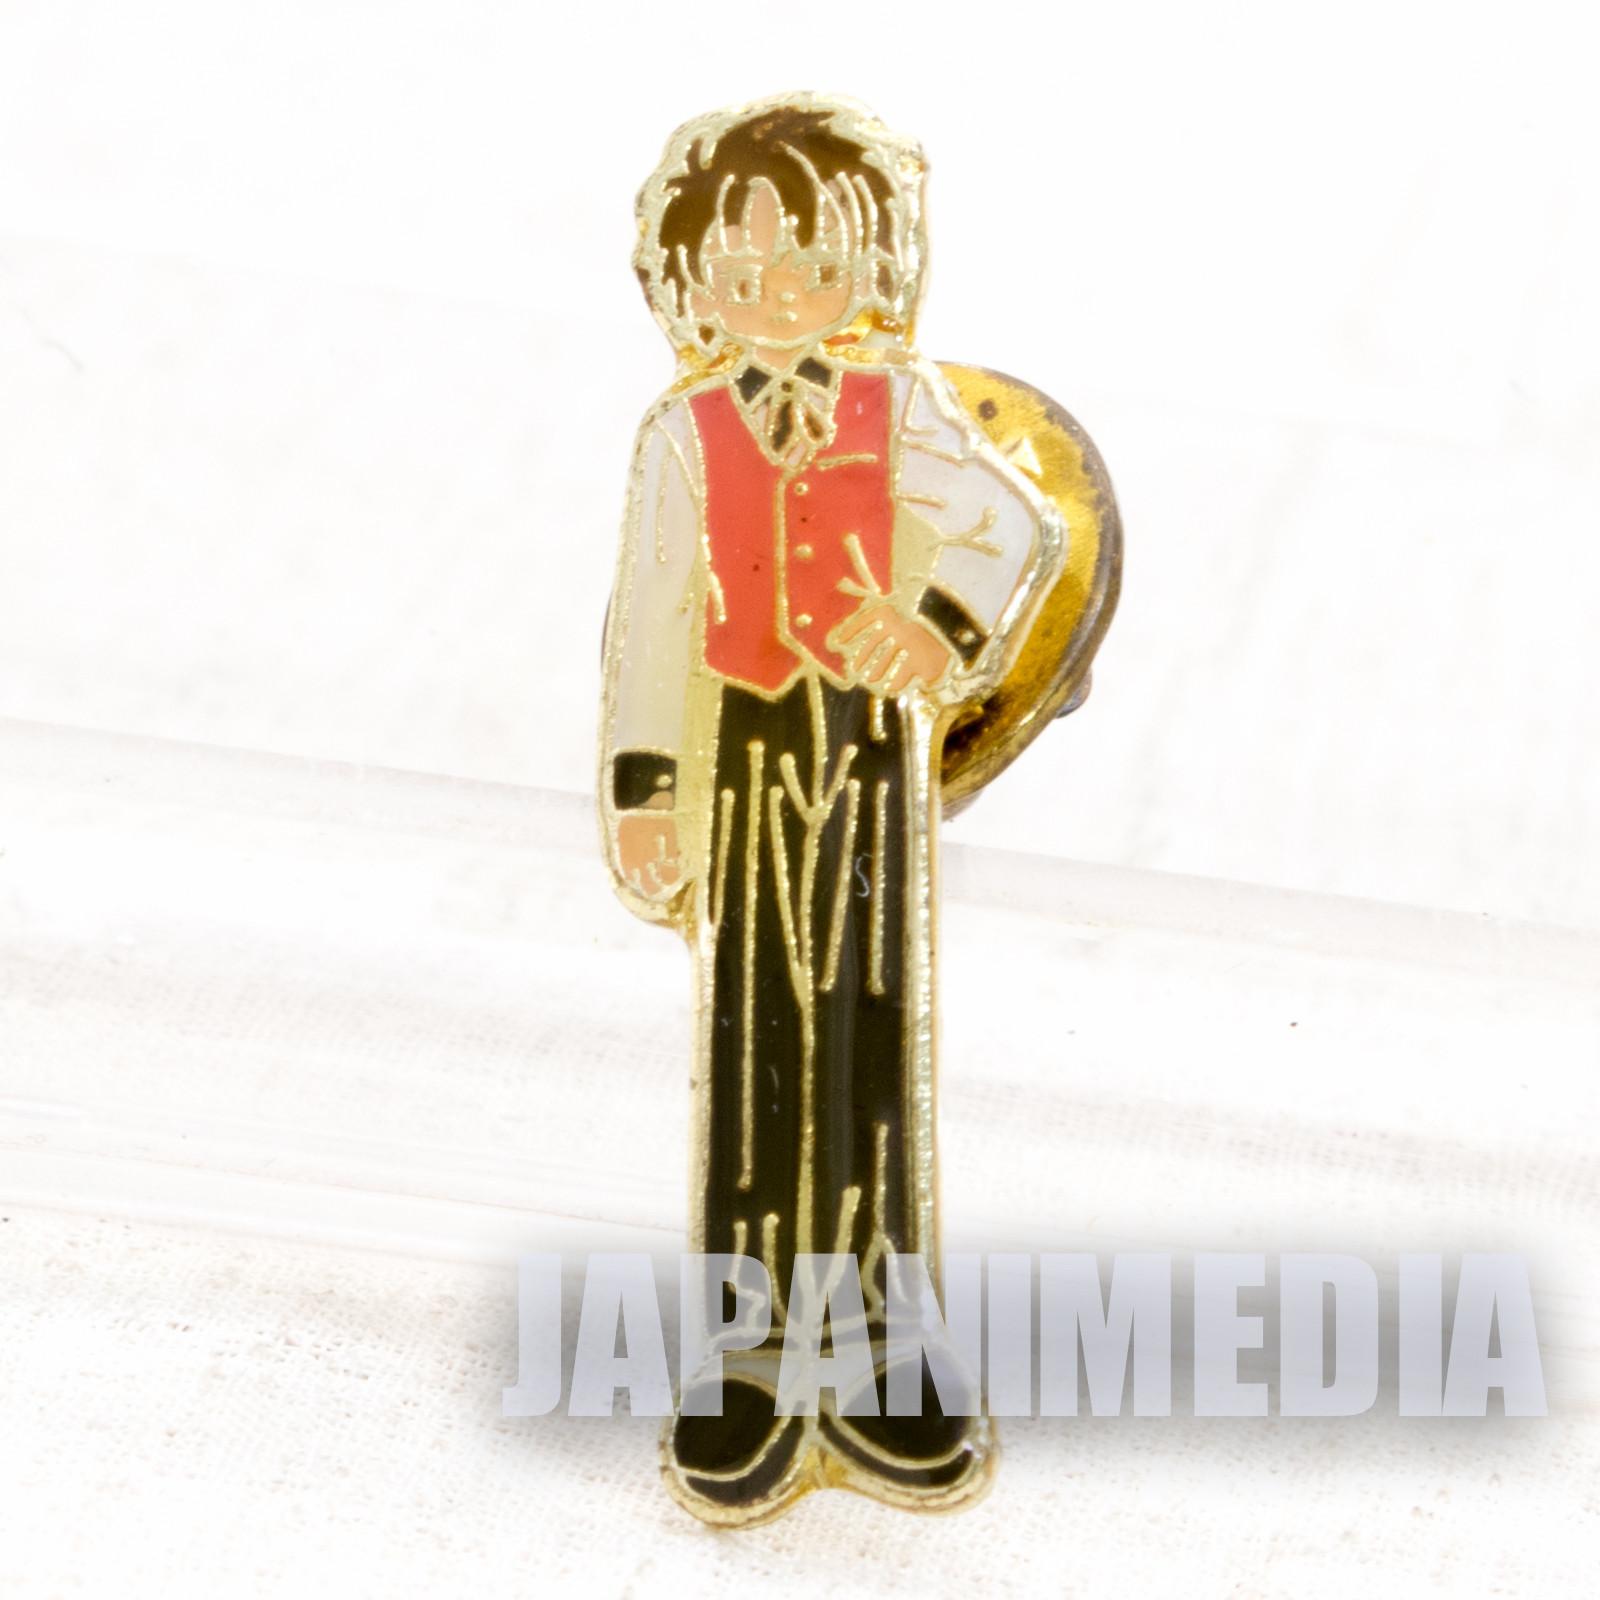 Cardcaptor Sakura Syaoran Li Sakura Pins CLAMP JAPAN ANIME #12